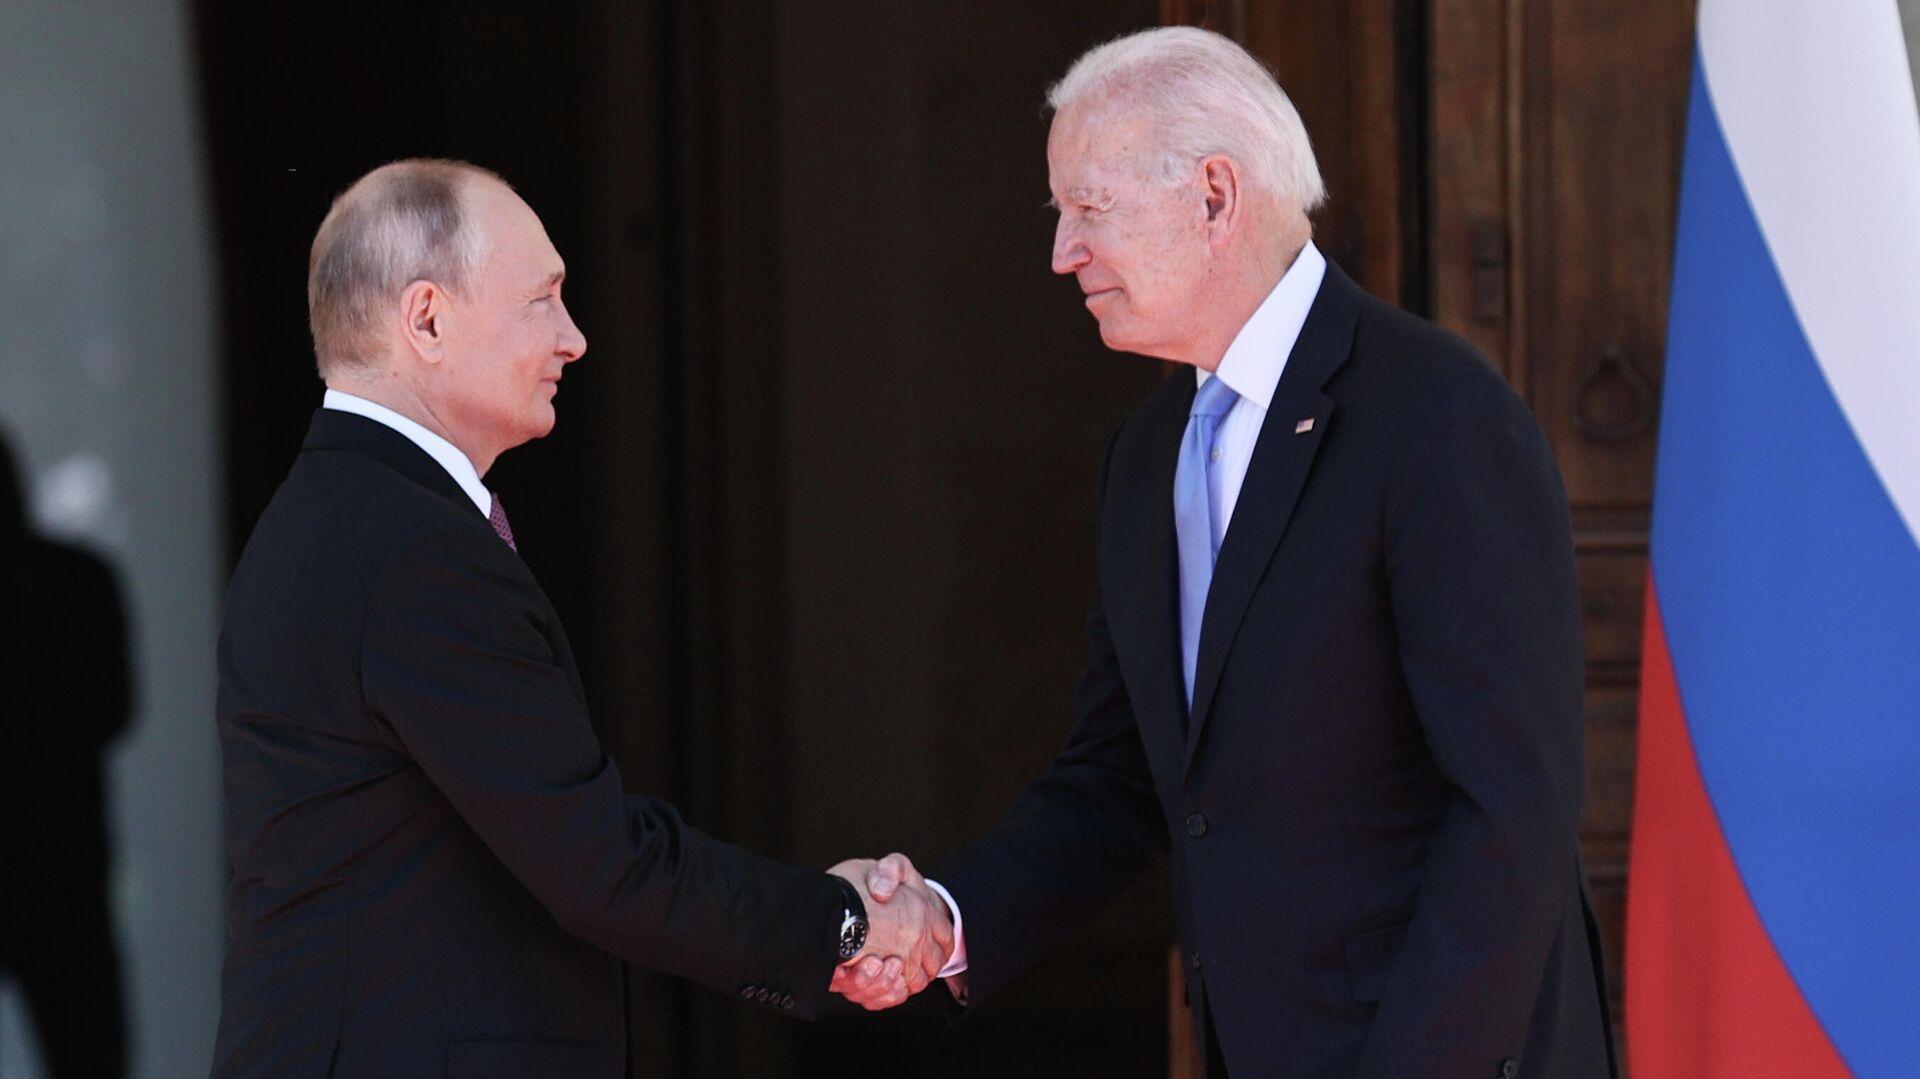 Президент РФ Владимир Путин и президент США Джо Байден во время встречи в Женеве на вилле Ла Гранж - РИА Новости, 1920, 23.06.2021